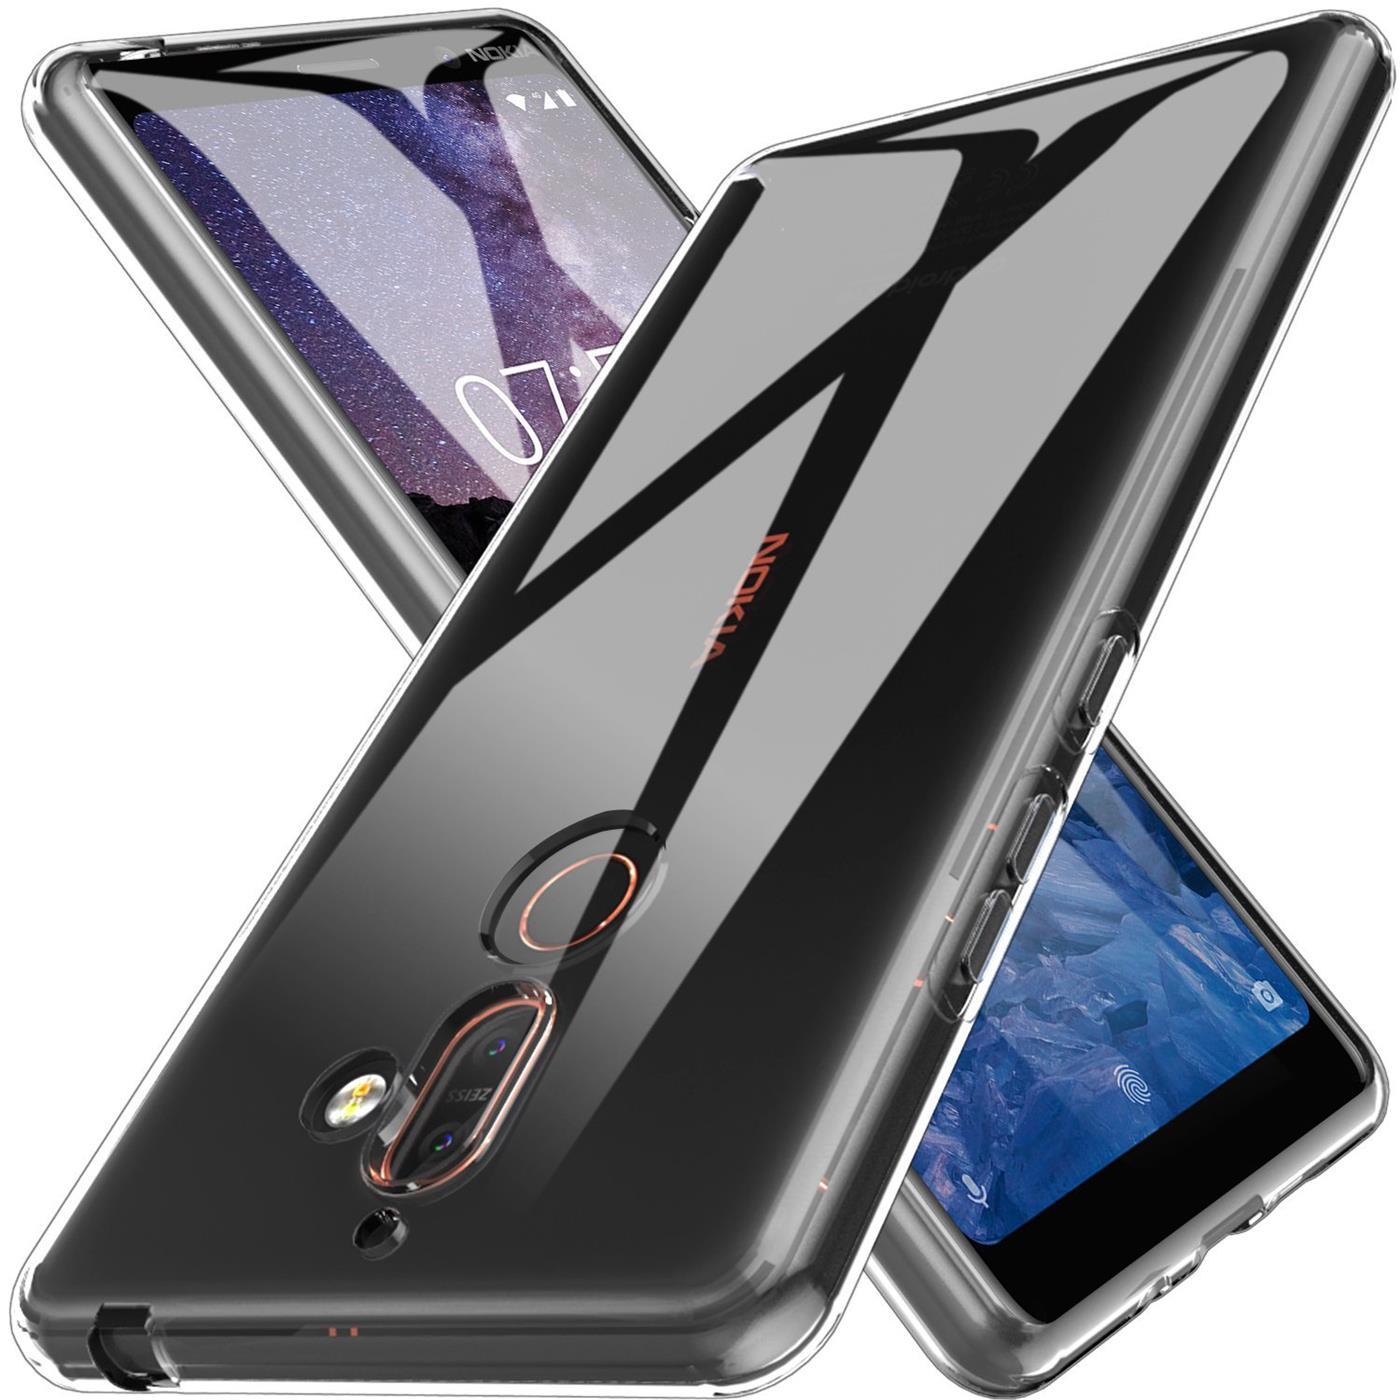 Nokia-7-Plus-Thin-Silikon-Klar-Case-Cover-Ultra-Slim-Stossfeste-Gel-Rueckseite Indexbild 8